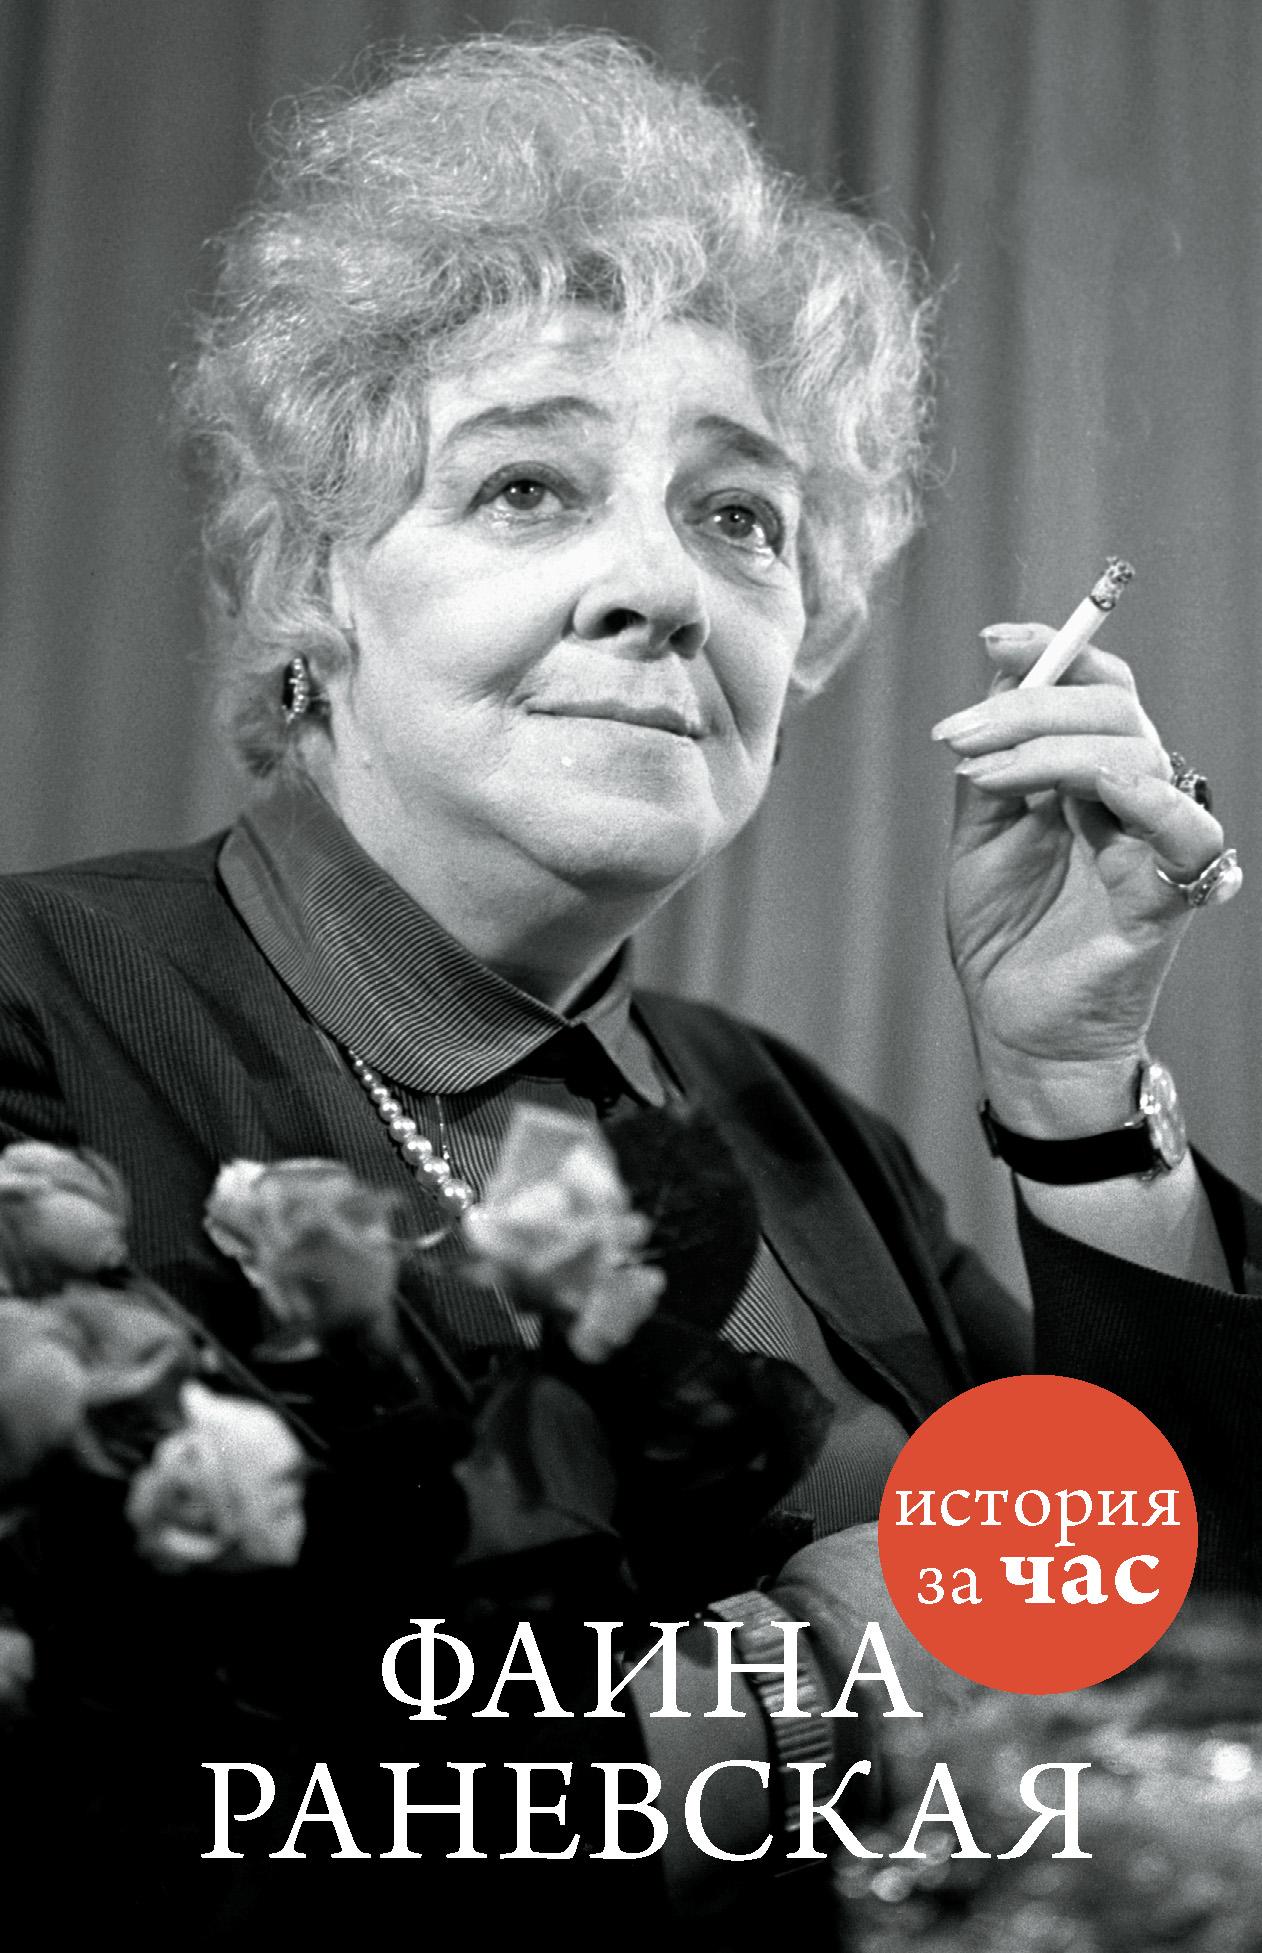 Отсутствует Фаина Раневская отсутствует фаина раневская клочки воспоминаний